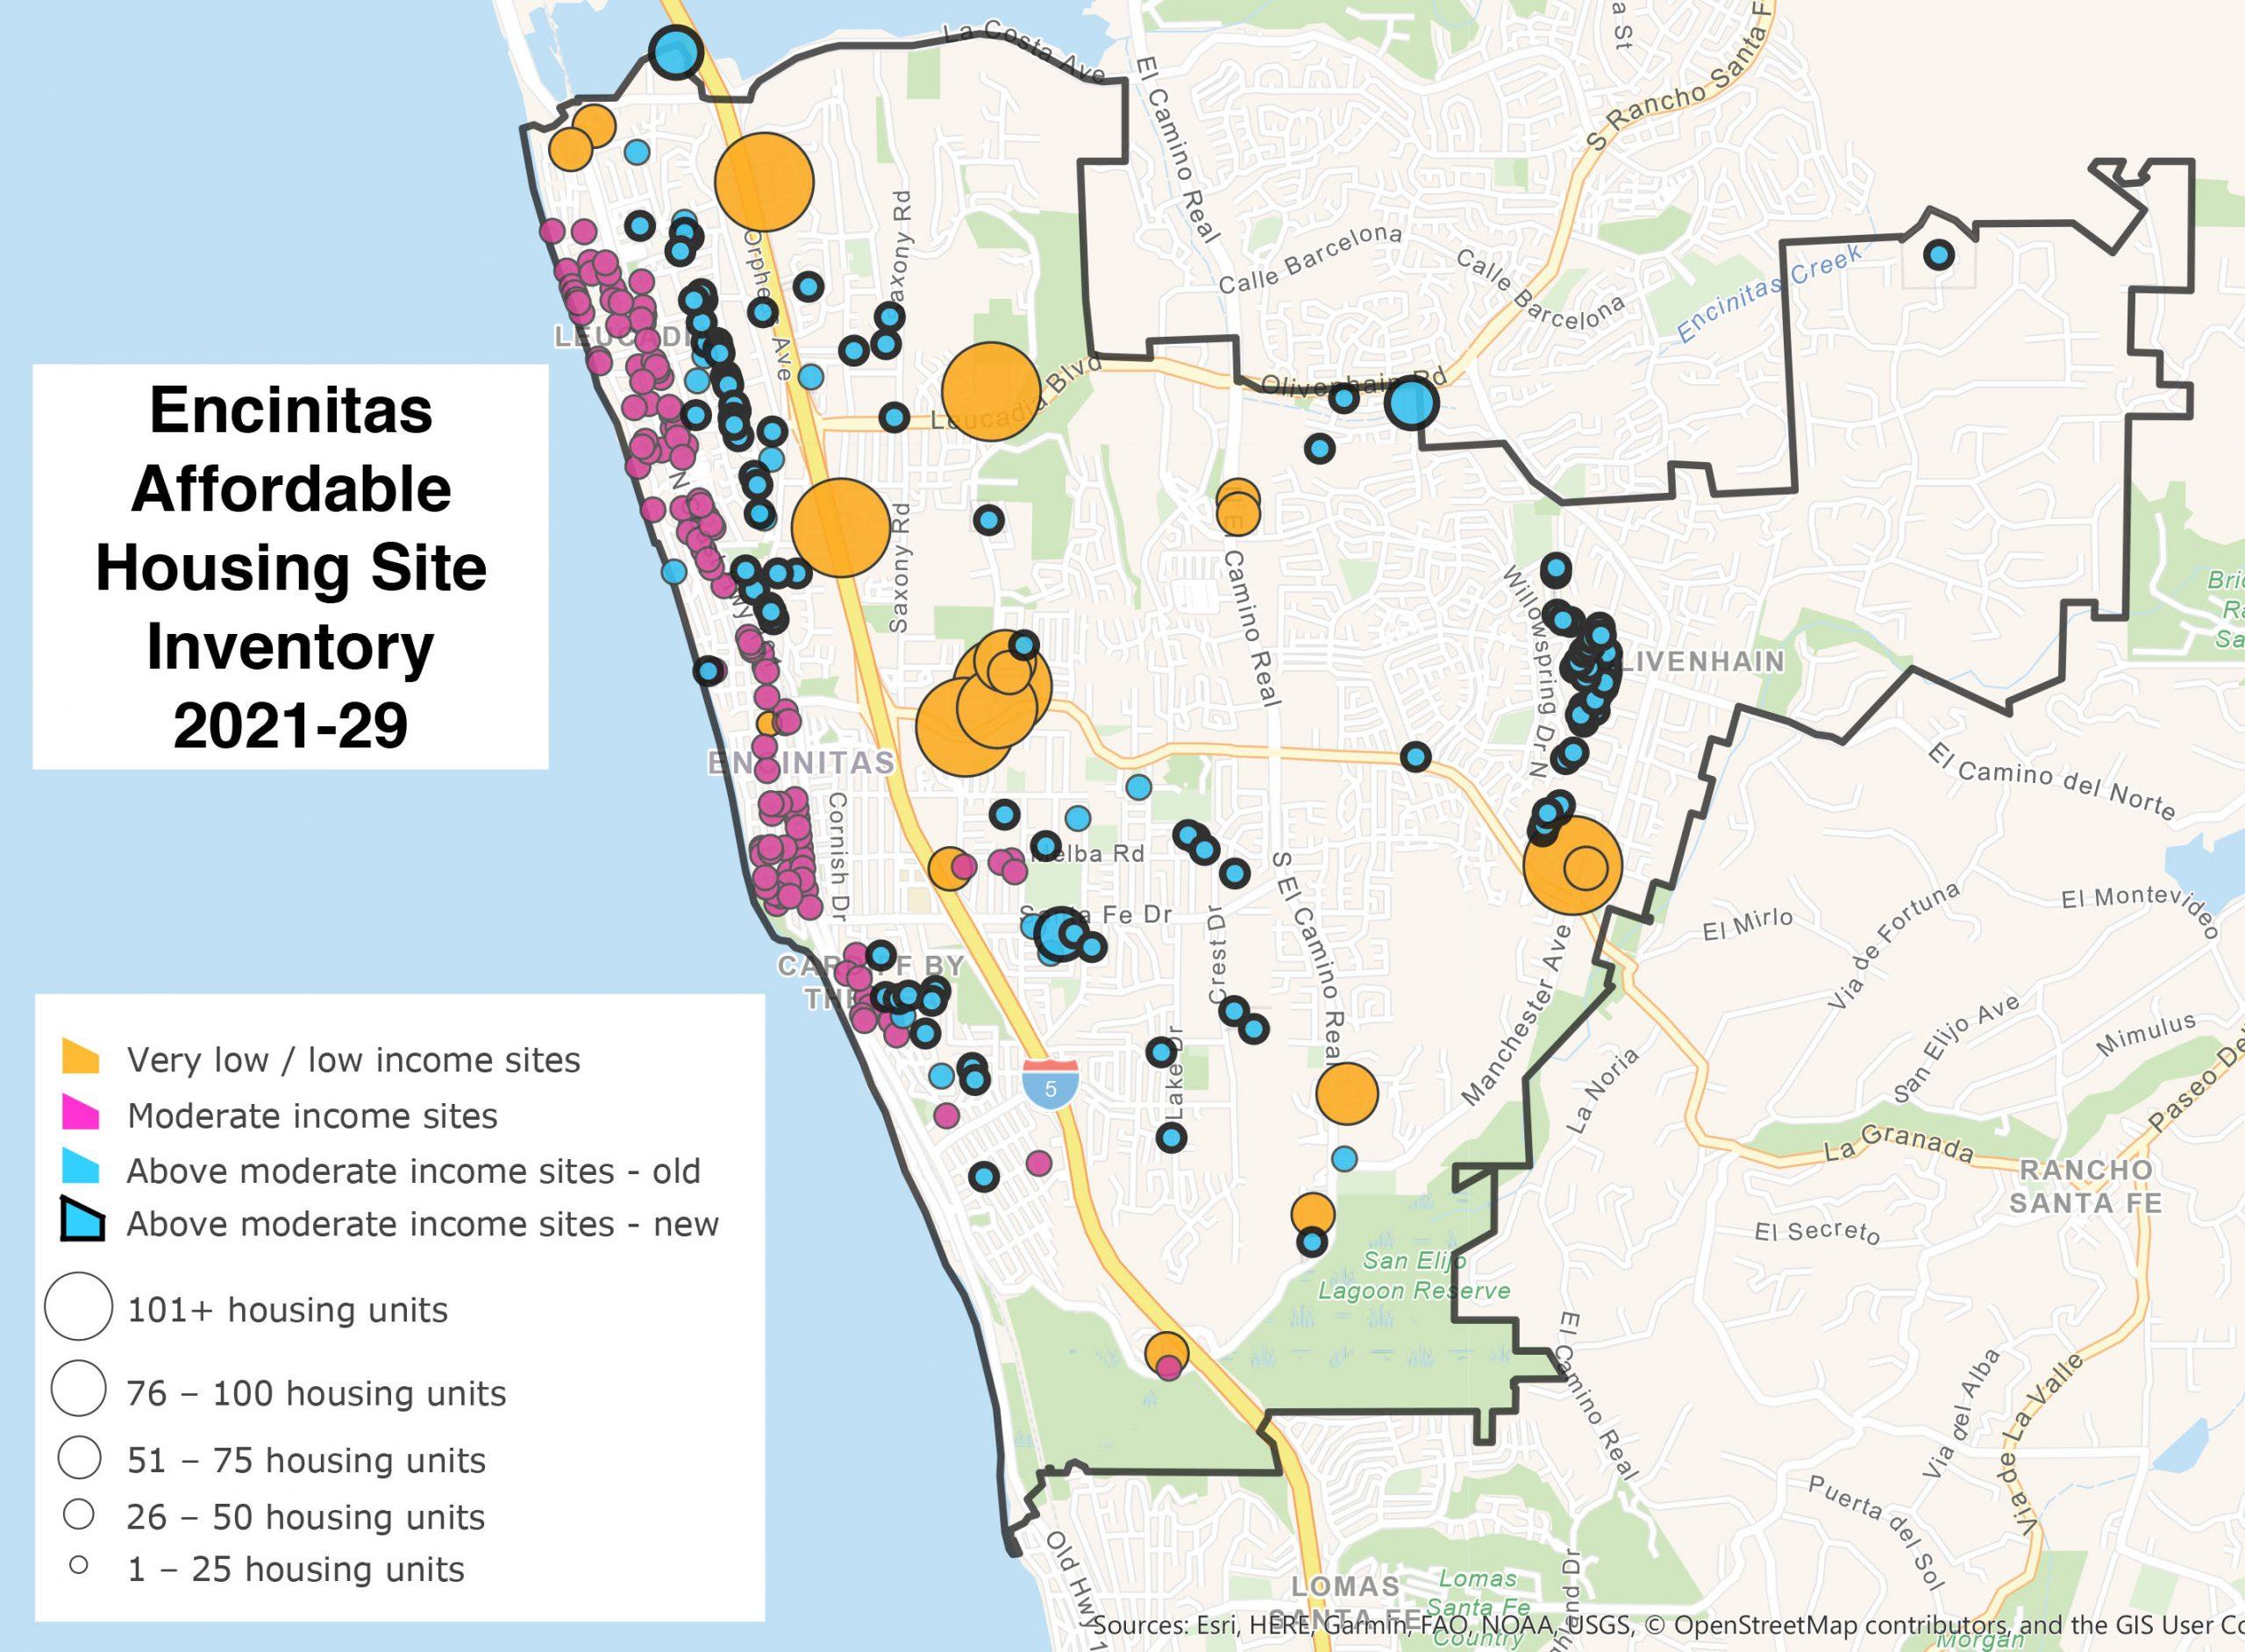 Encinitas Map Affordable Housing